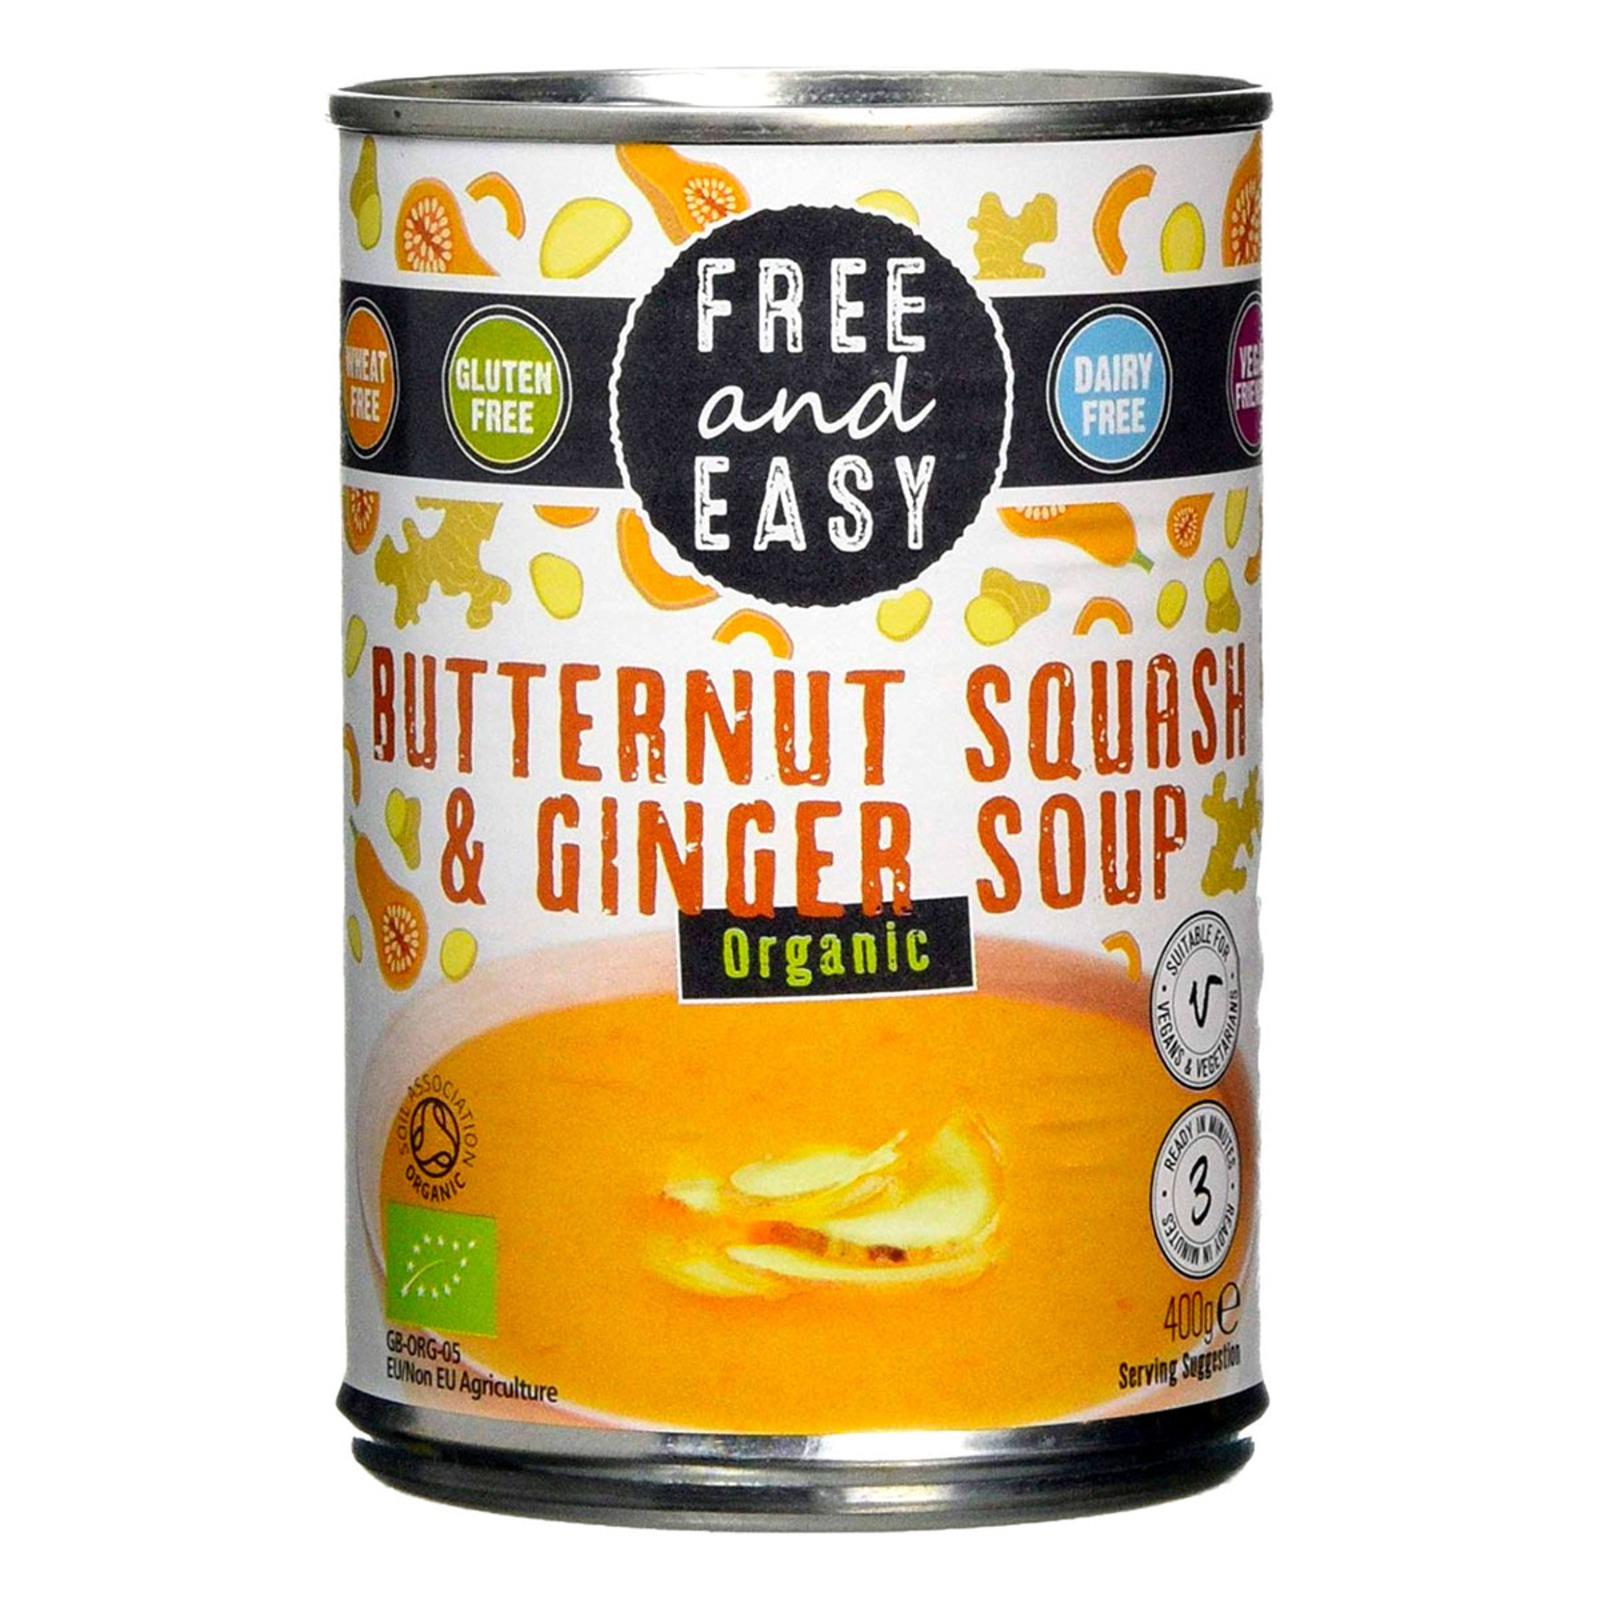 Free & Easy Organic Butternut Squash & Ginger Soup